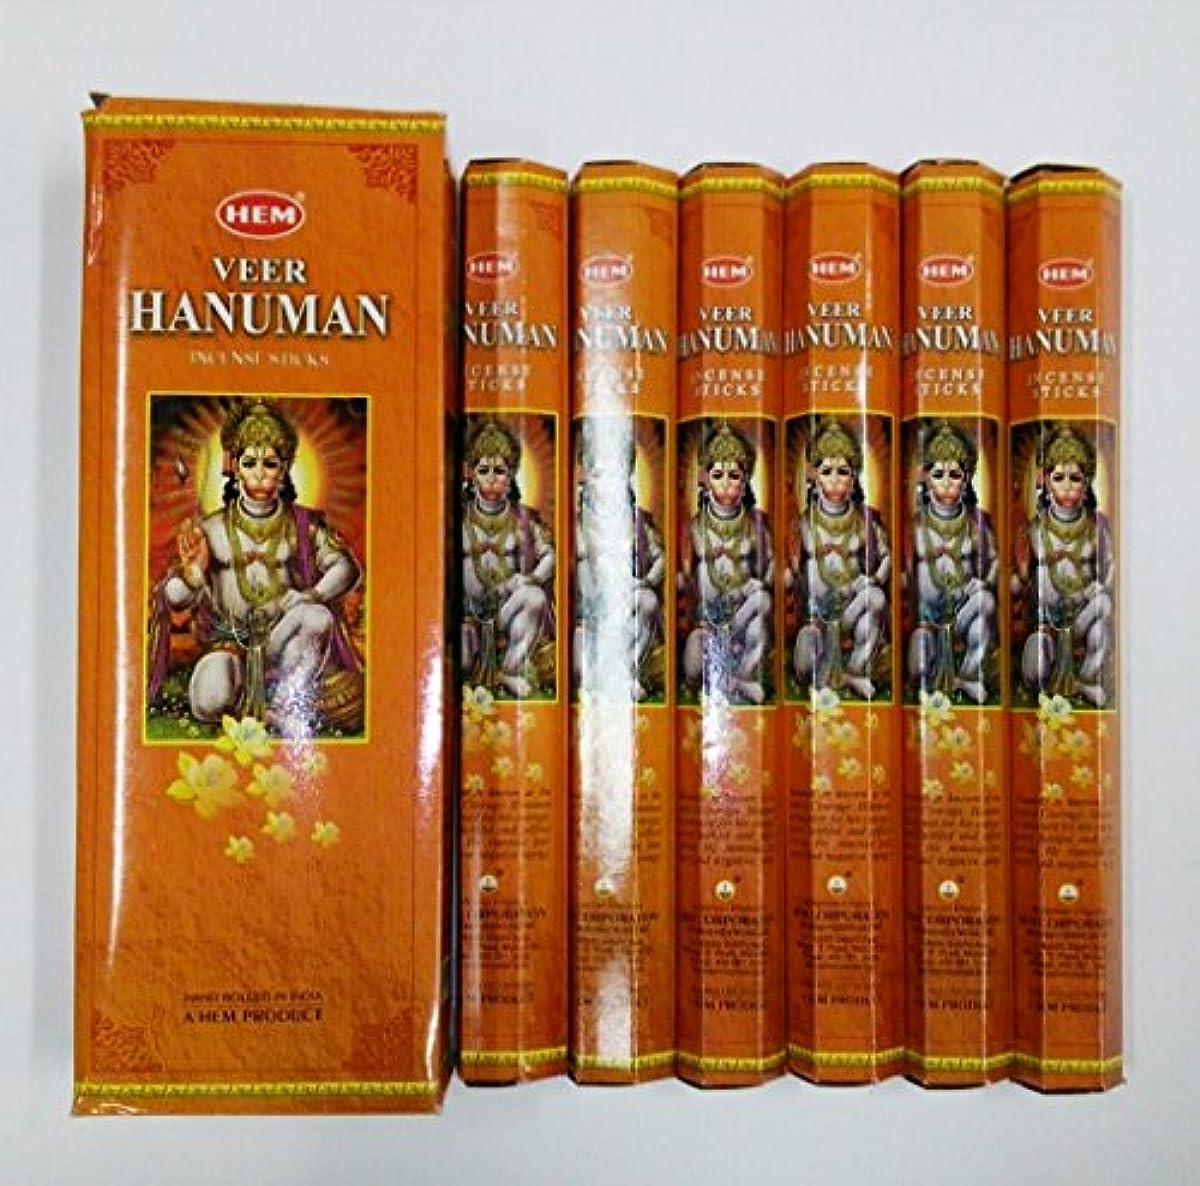 HEM (ヘム) インセンス スティック へキサパック ハヌマーン ハヌマン香 6角(20本入)×6箱 [並行輸入品] Hanuman